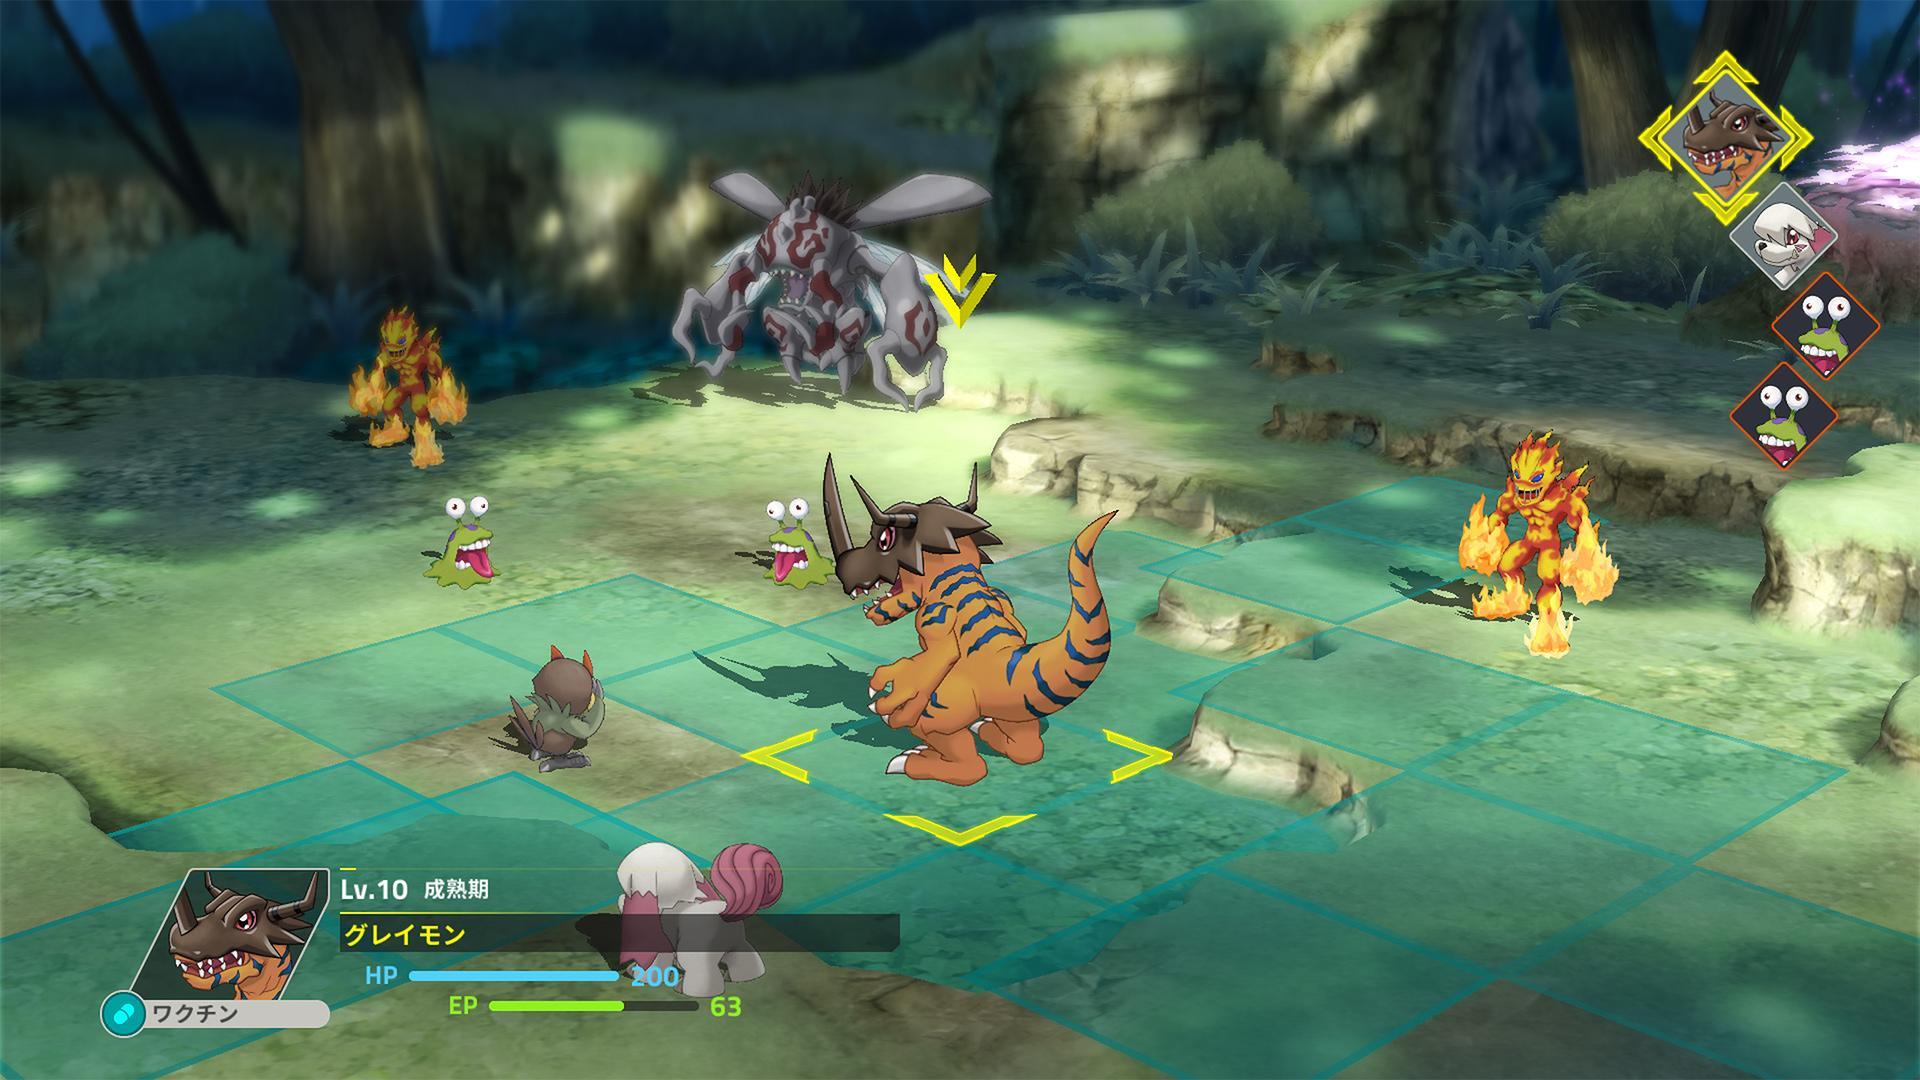 Bandai Namco is streaming an anime game showcase on July 22 screenshot